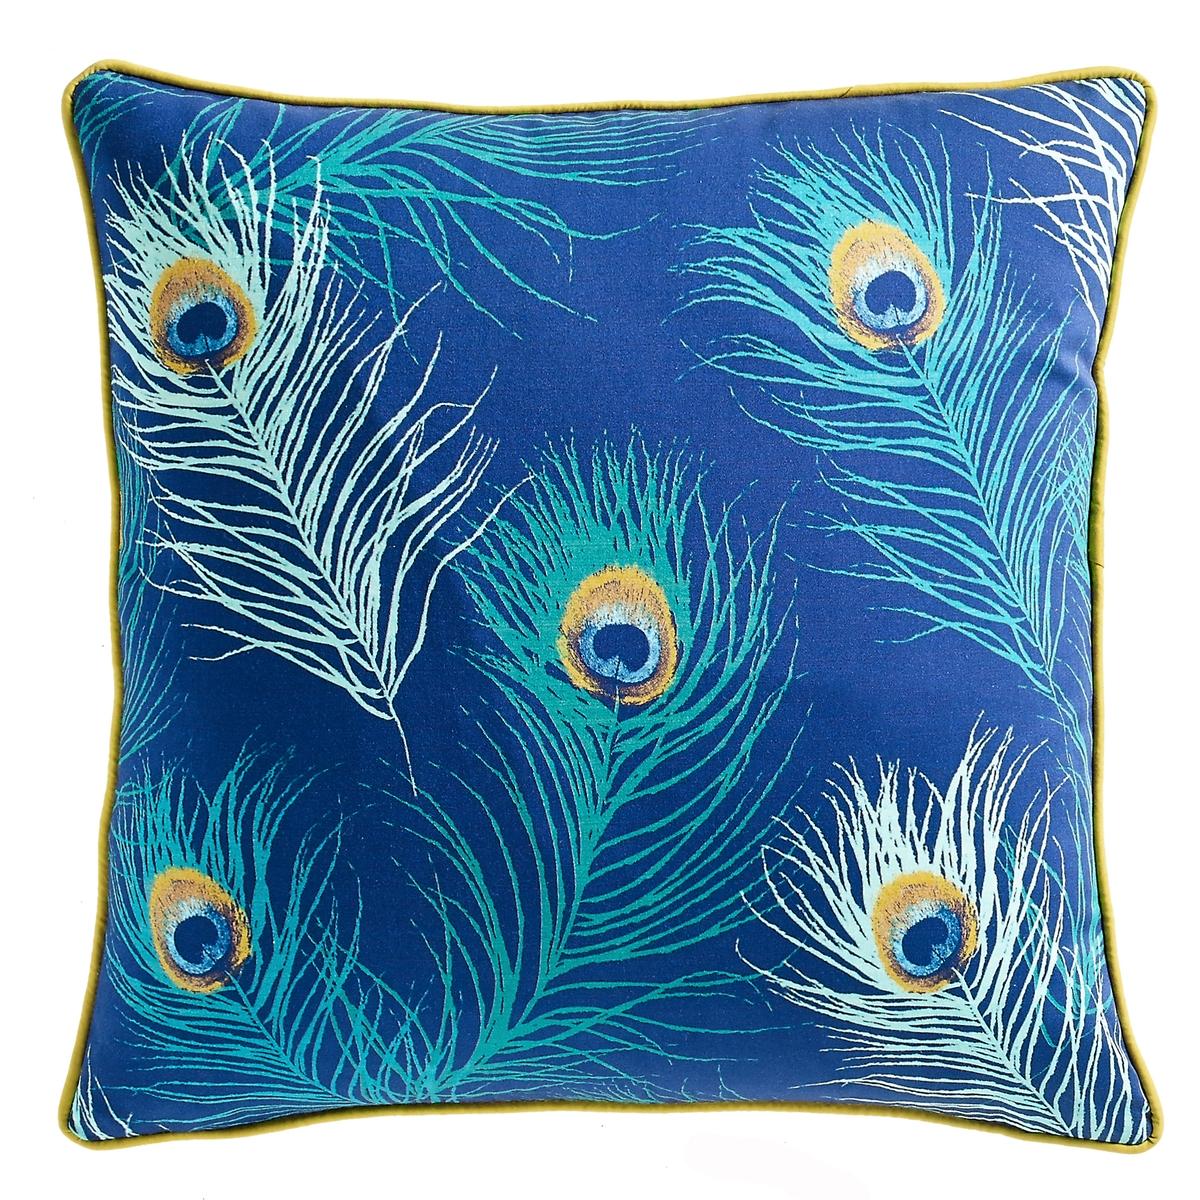 Чехол для подушки с рисунком, Shakhra